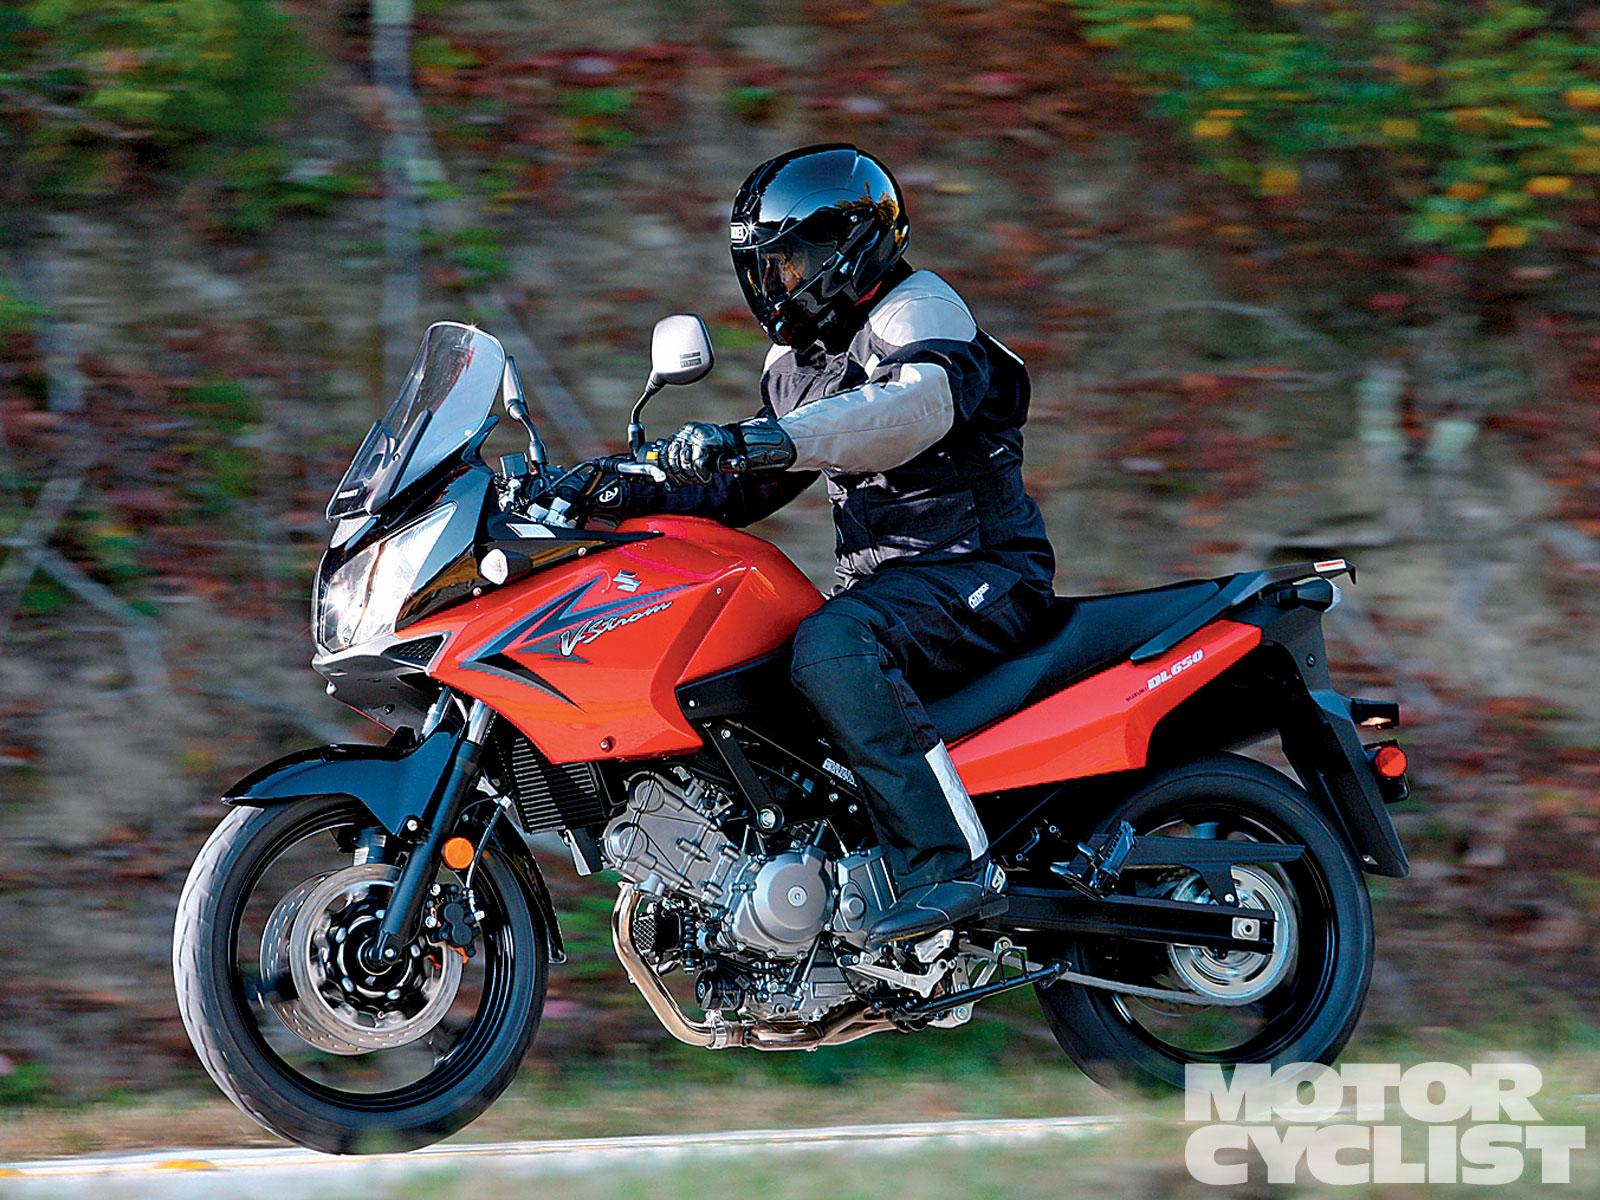 Marvelous 2004 2009 Suzuki Dl650 V Strom Motorcyclist Gamerscity Chair Design For Home Gamerscityorg